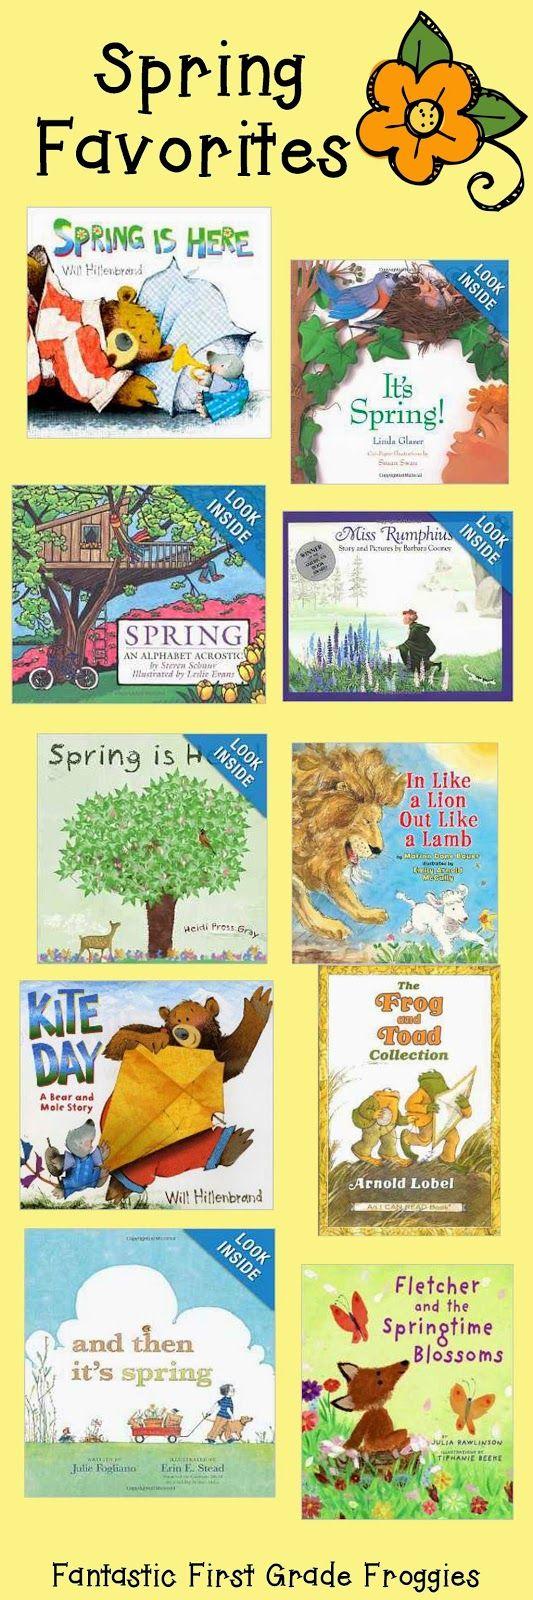 Fantastic First Grade Froggies: Spring Books